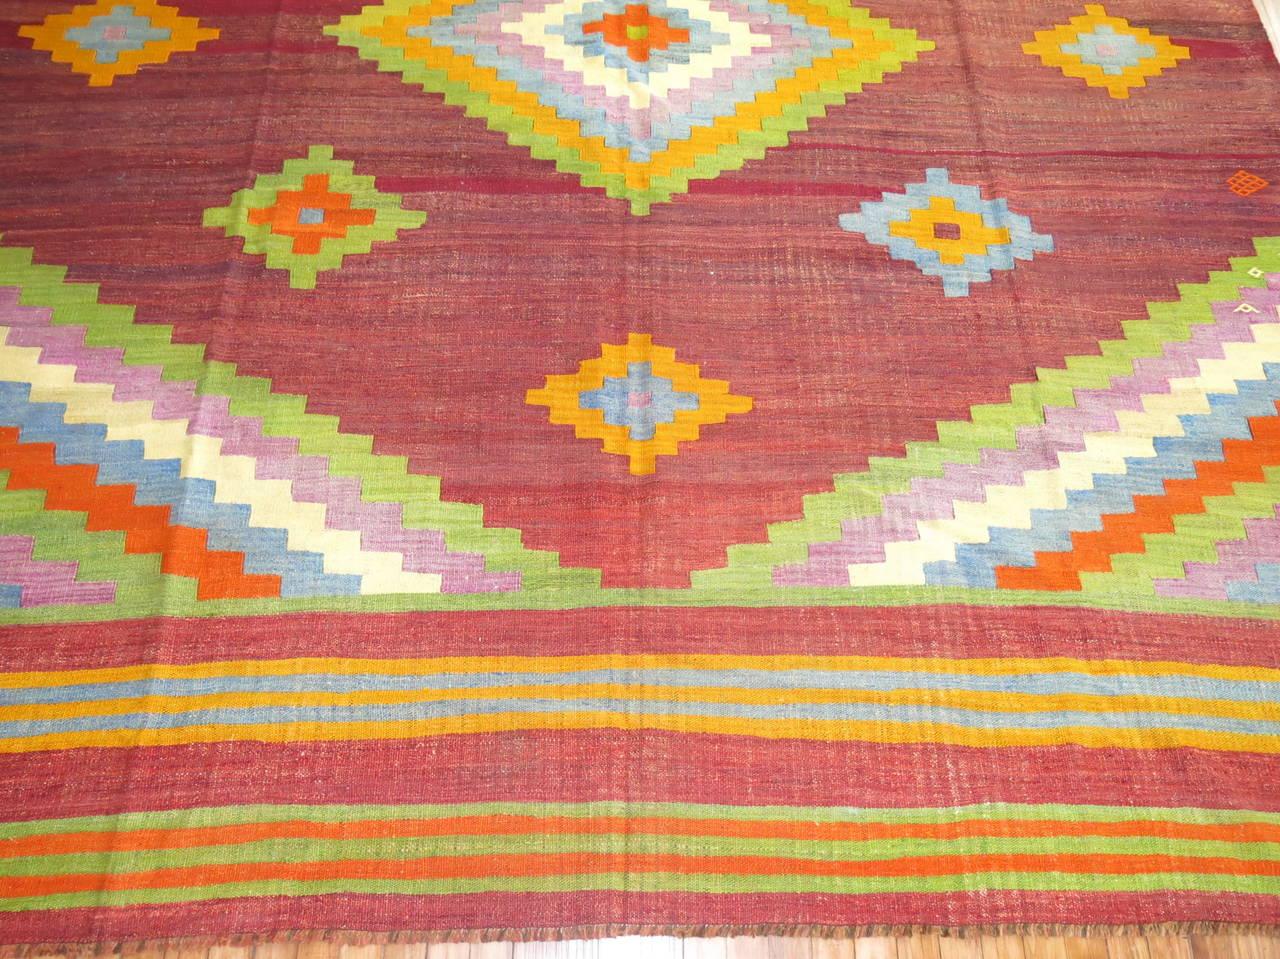 Hand-Knotted Vintage Turkish Kilim Flat-Weave Carpet For Sale